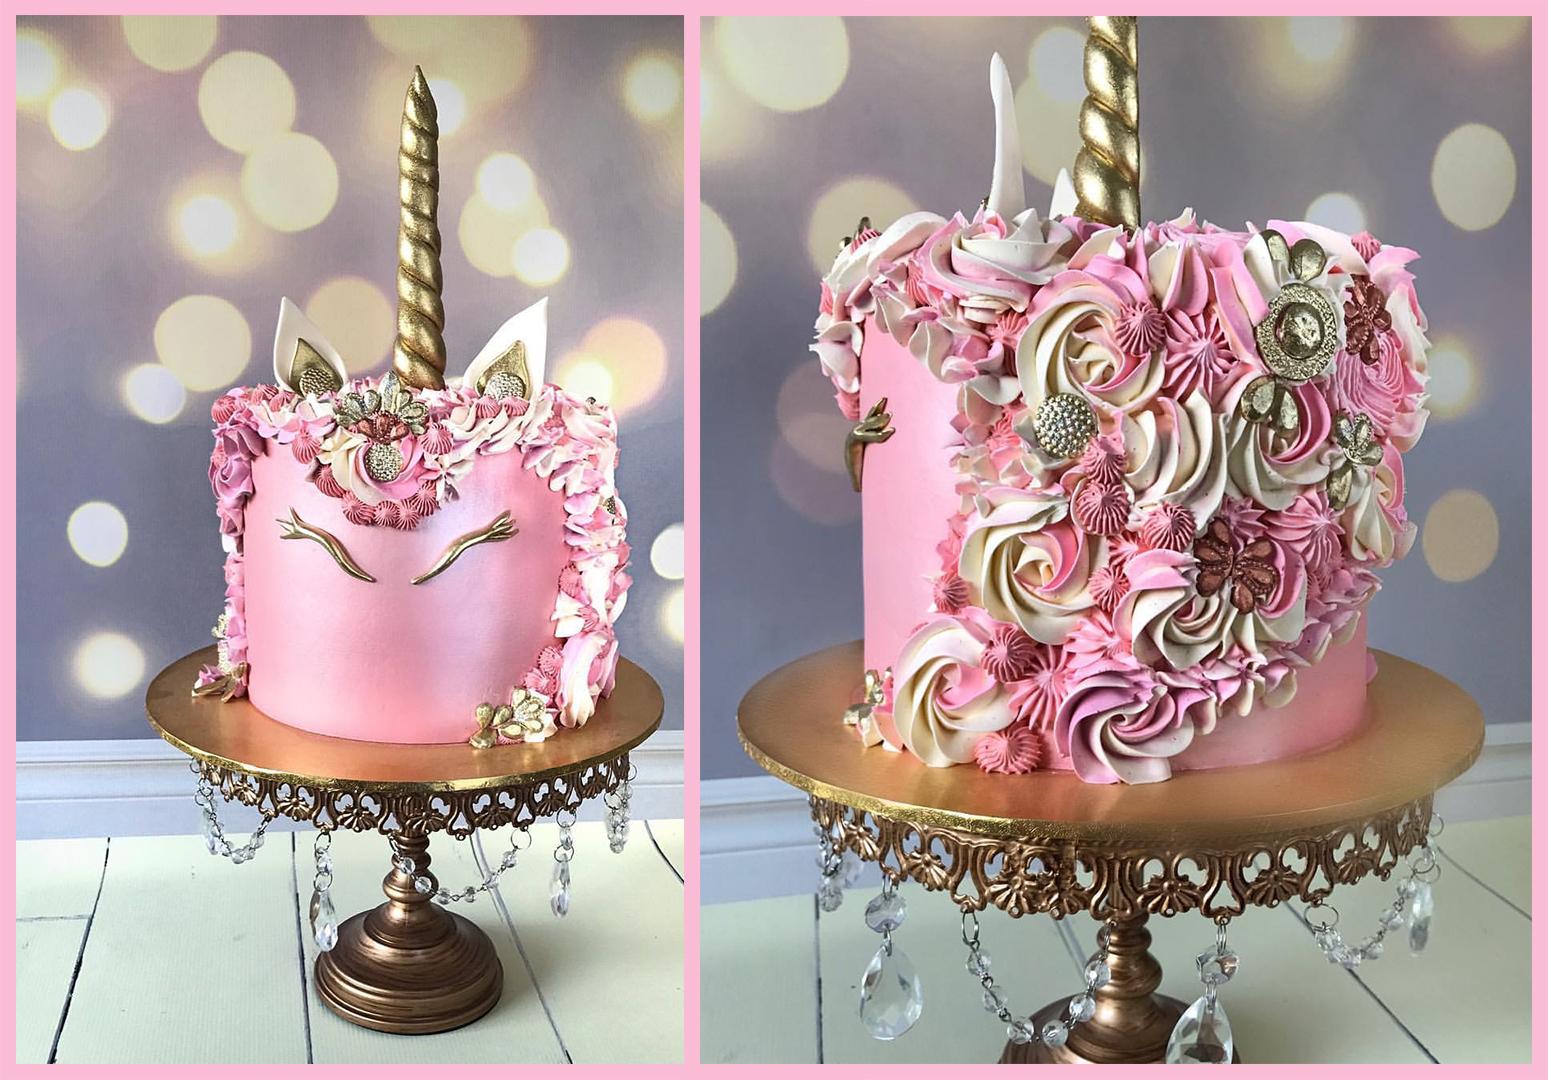 unicorn cake-lottieandbelle-chandeliercakestand-opulentreasures.jpg